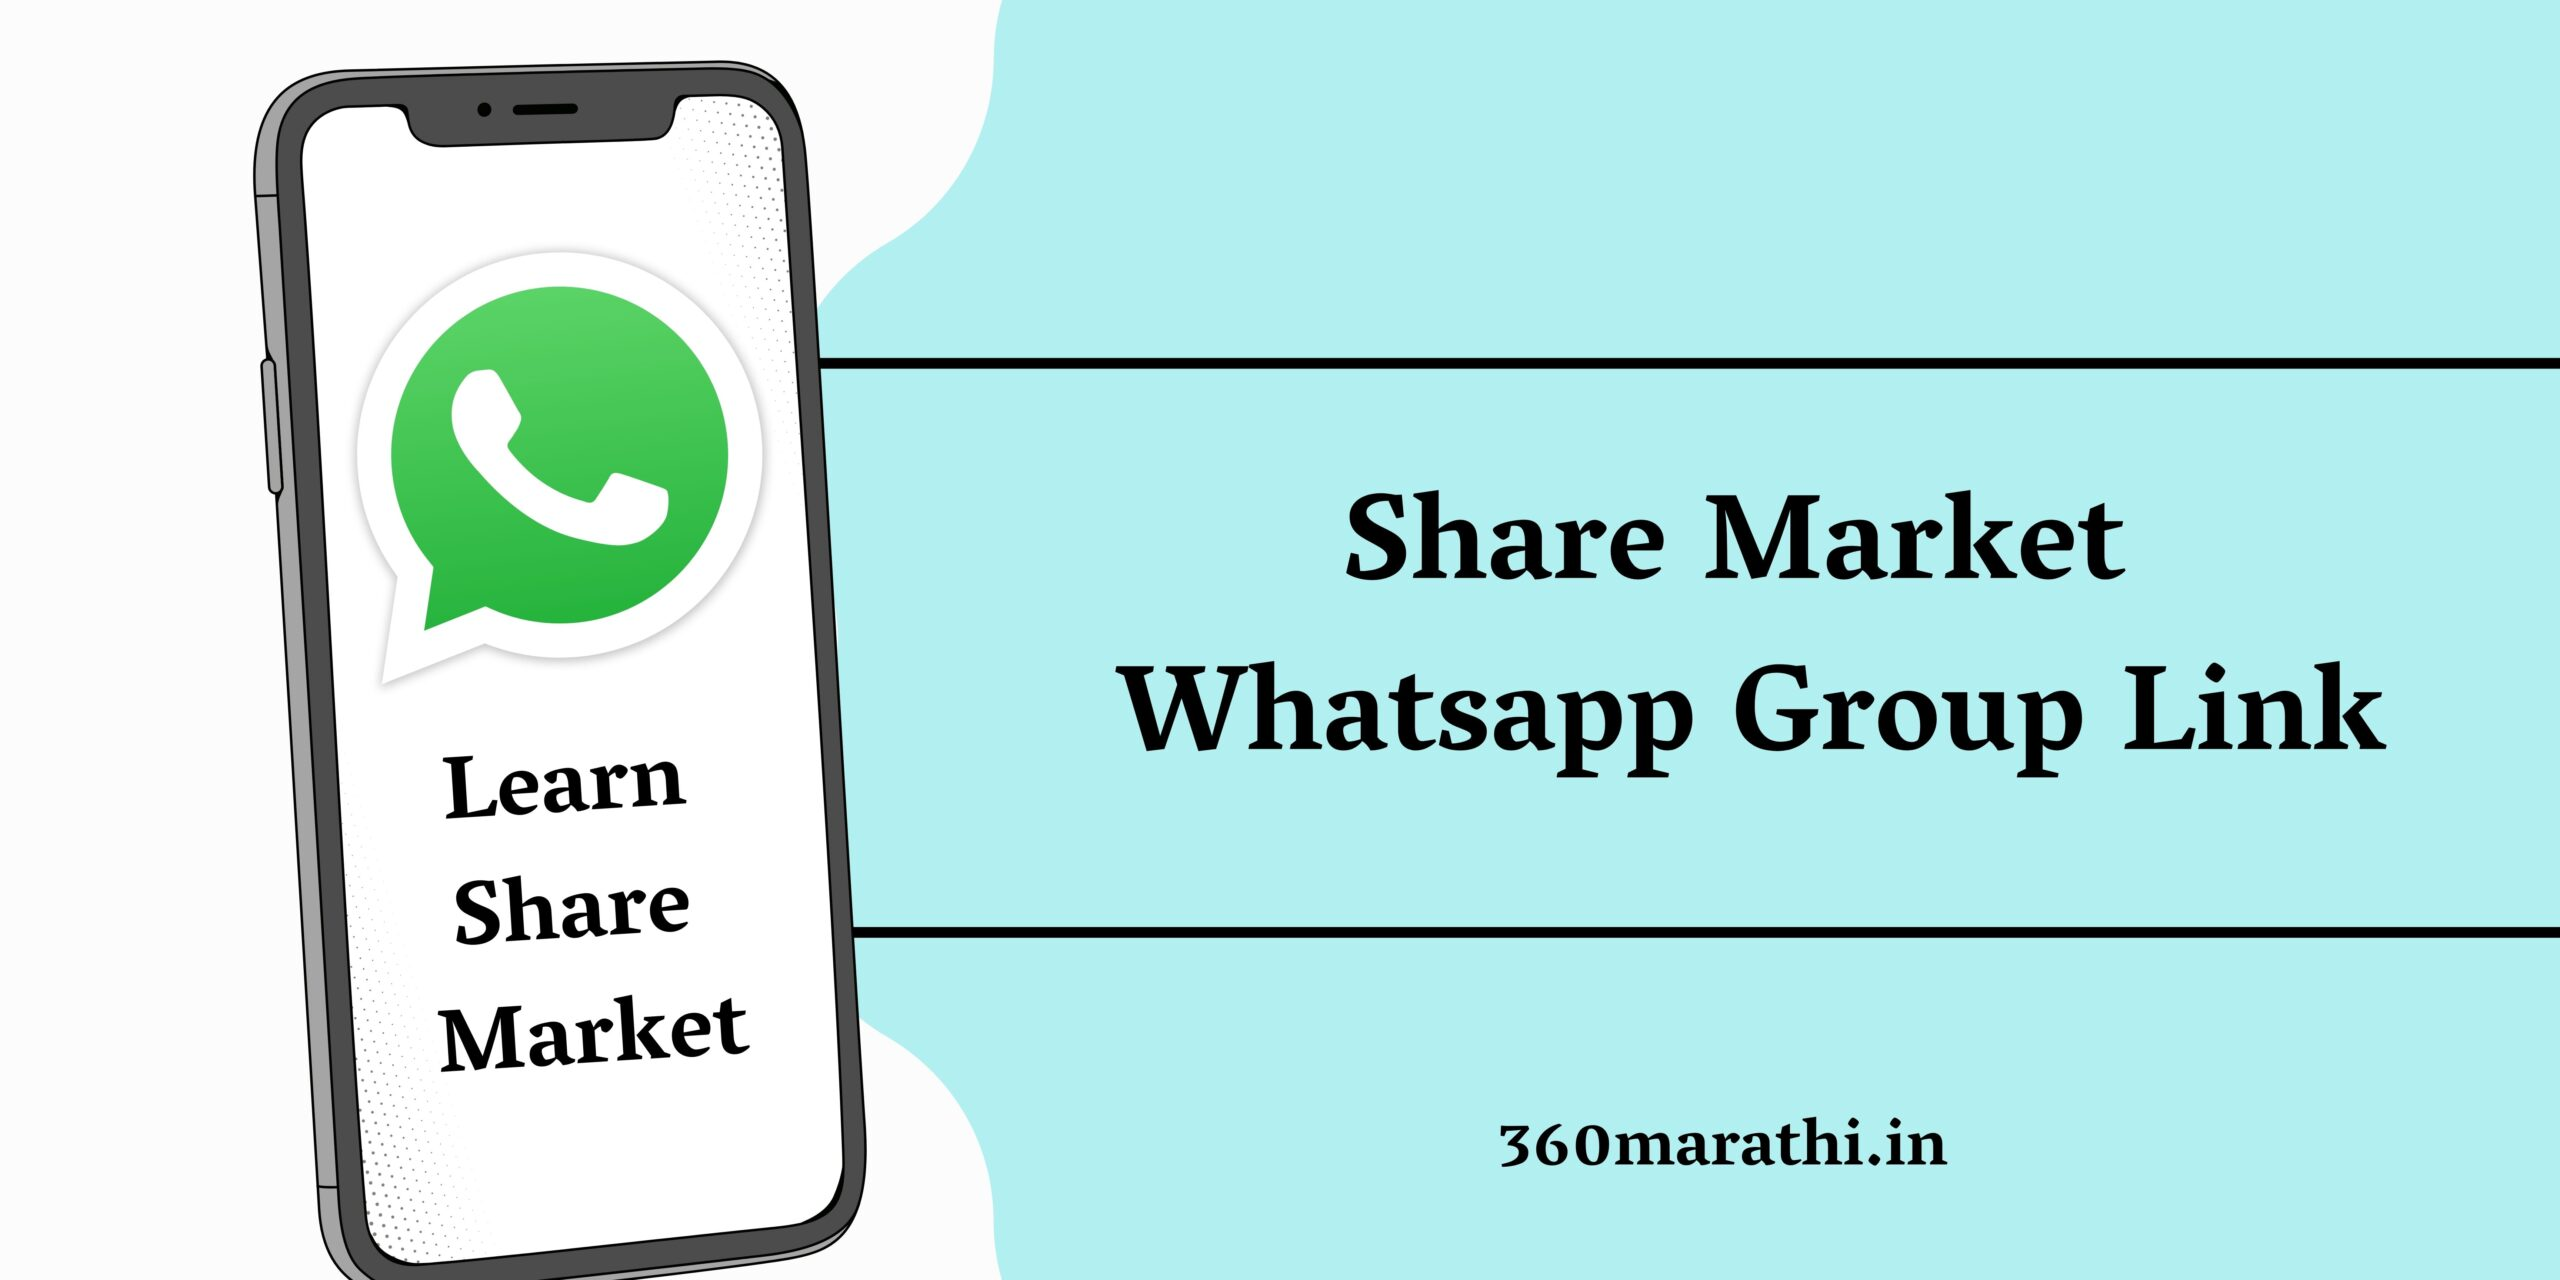 Share Market Tips Whatsapp Group Link | Share Market Whatsapp Group Link For Daily Tips